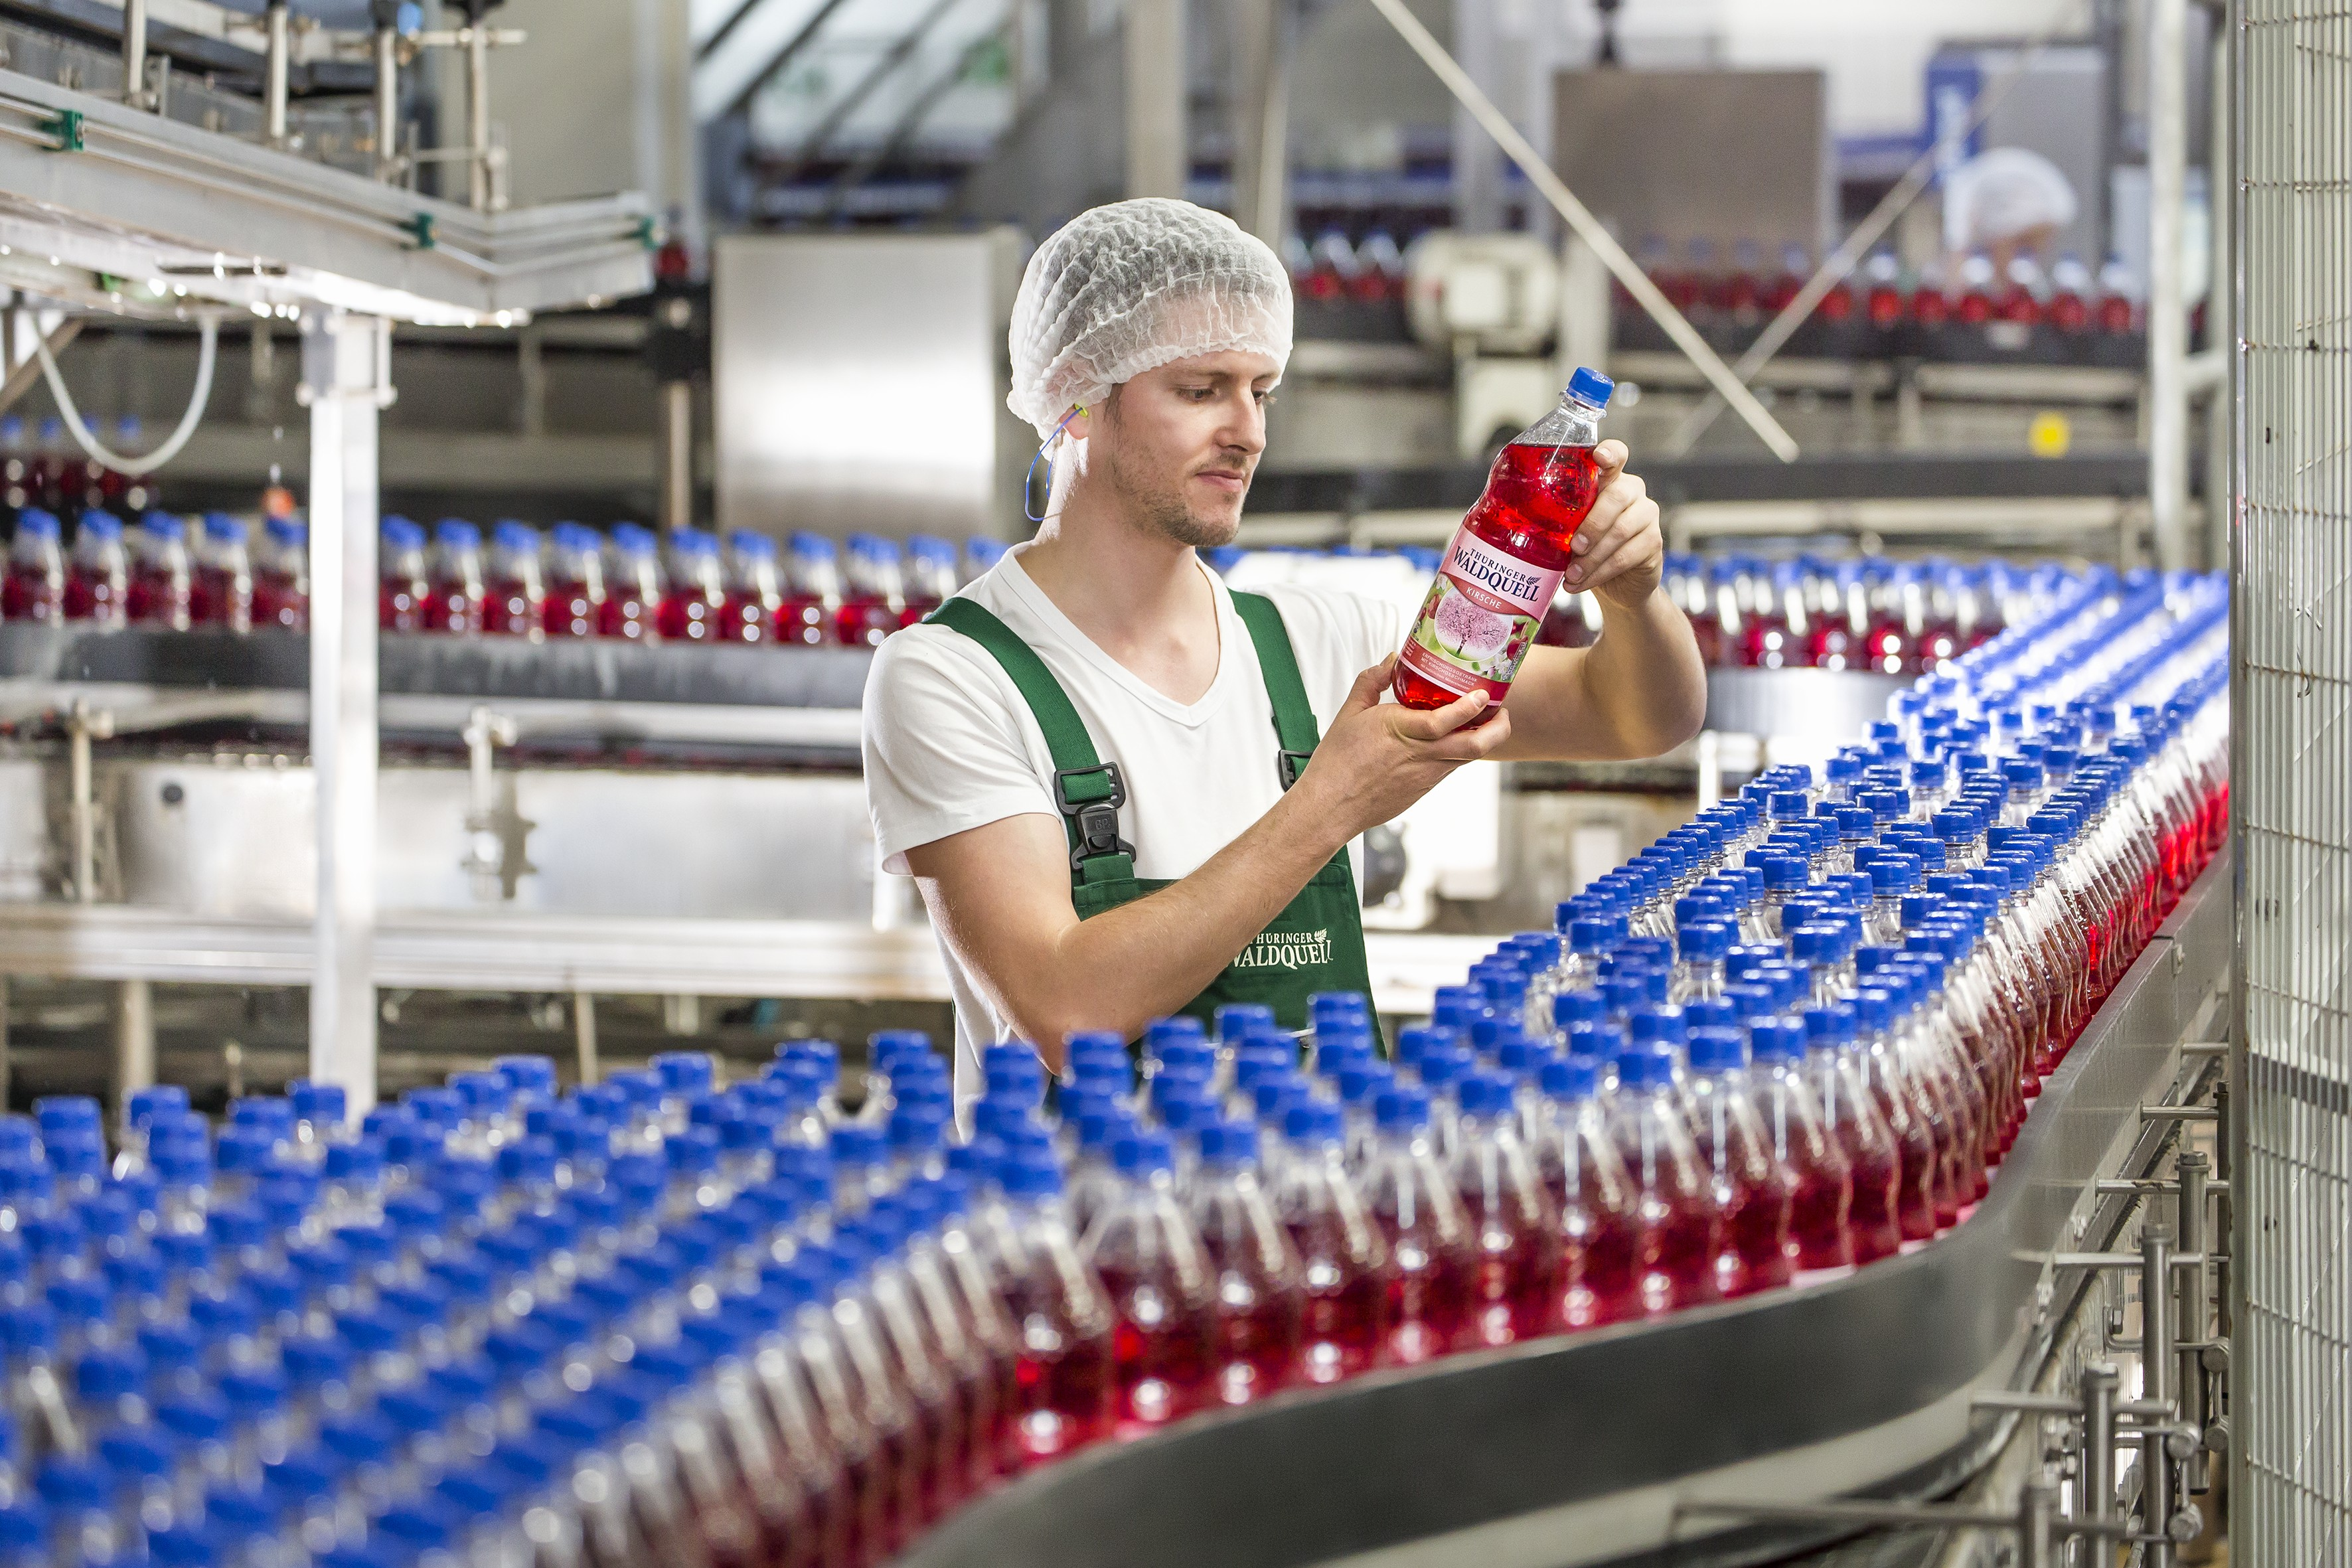 Thüringer Waldquell Mineralbrunnen GmbH